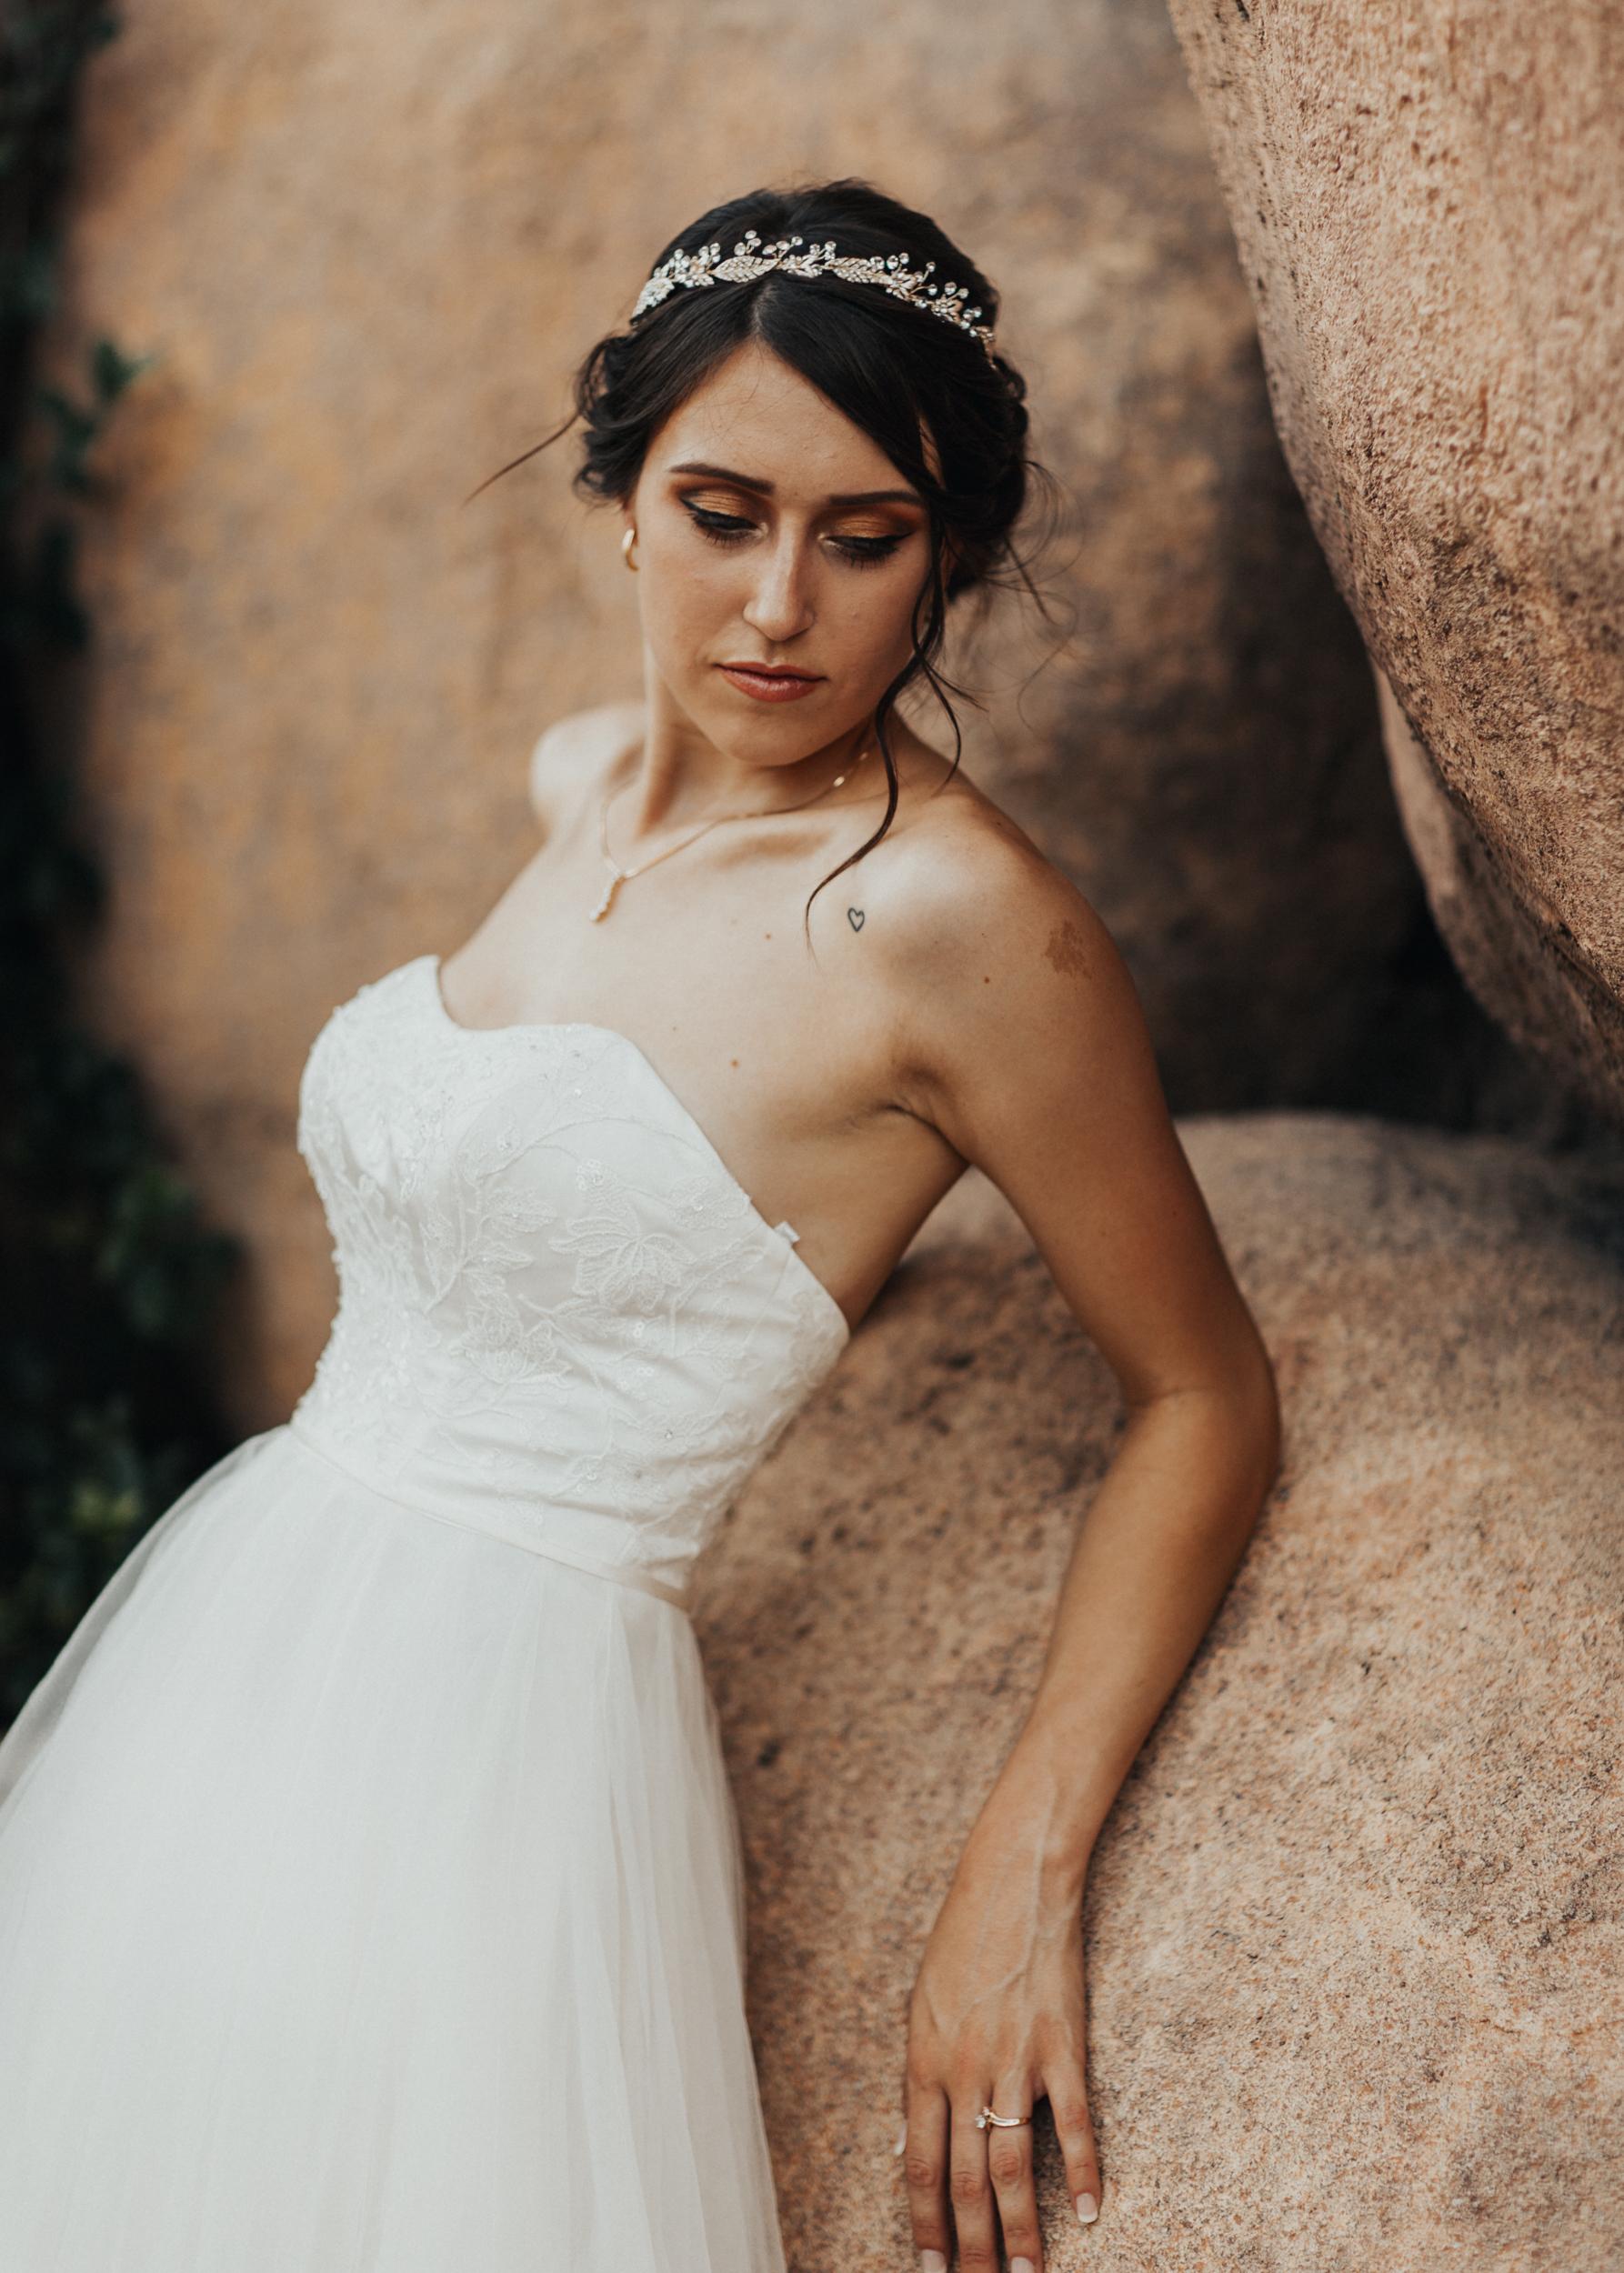 L'Cee_Bridal-124.jpg